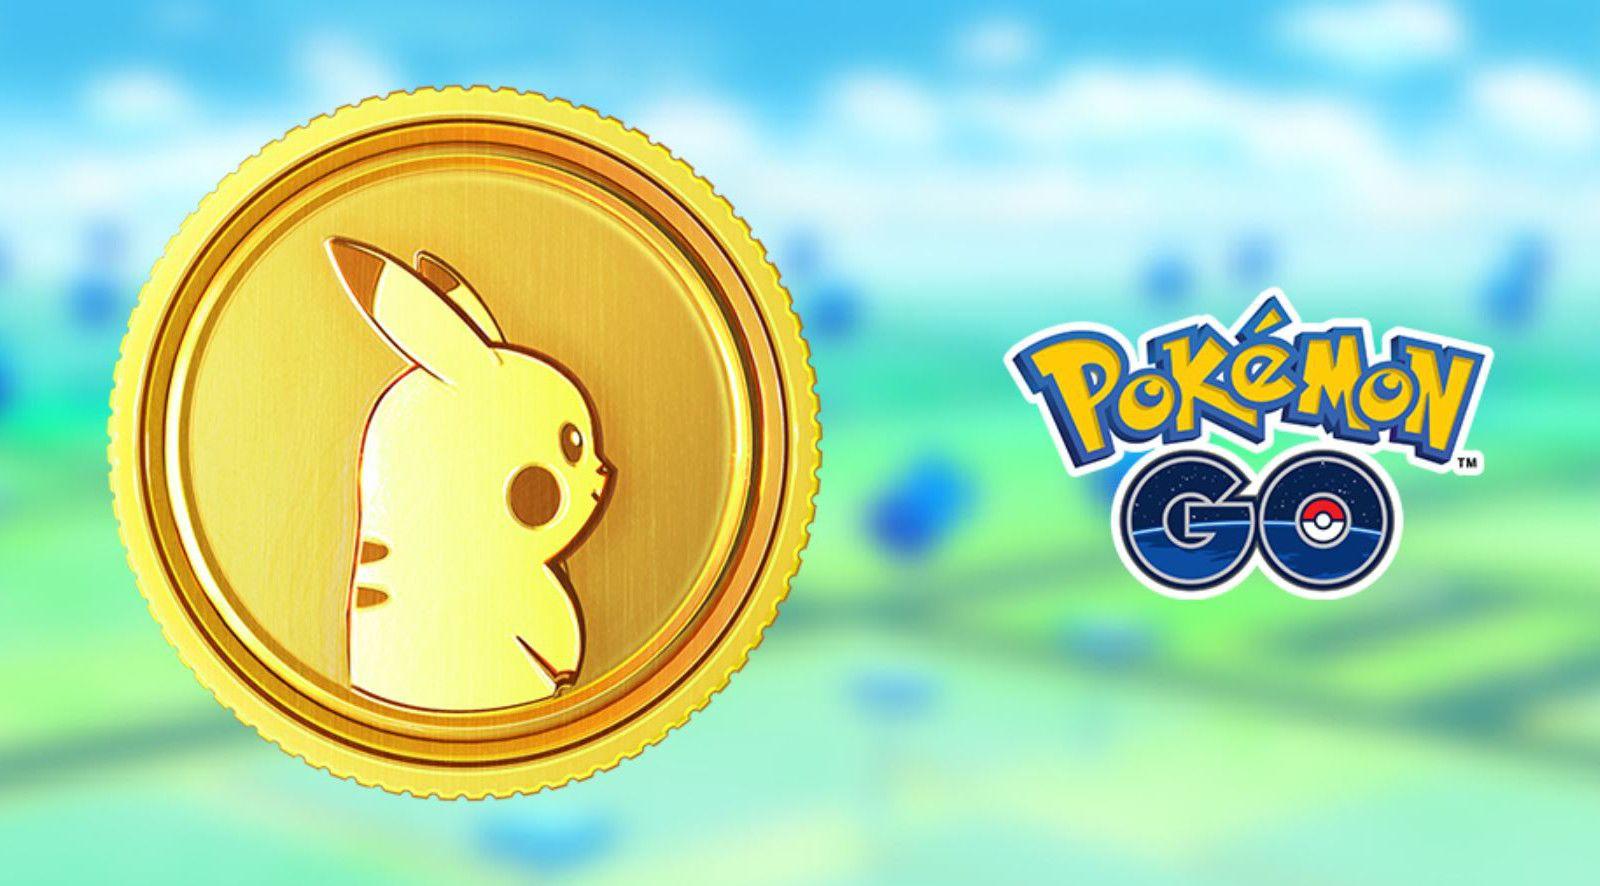 Pokémon monedas